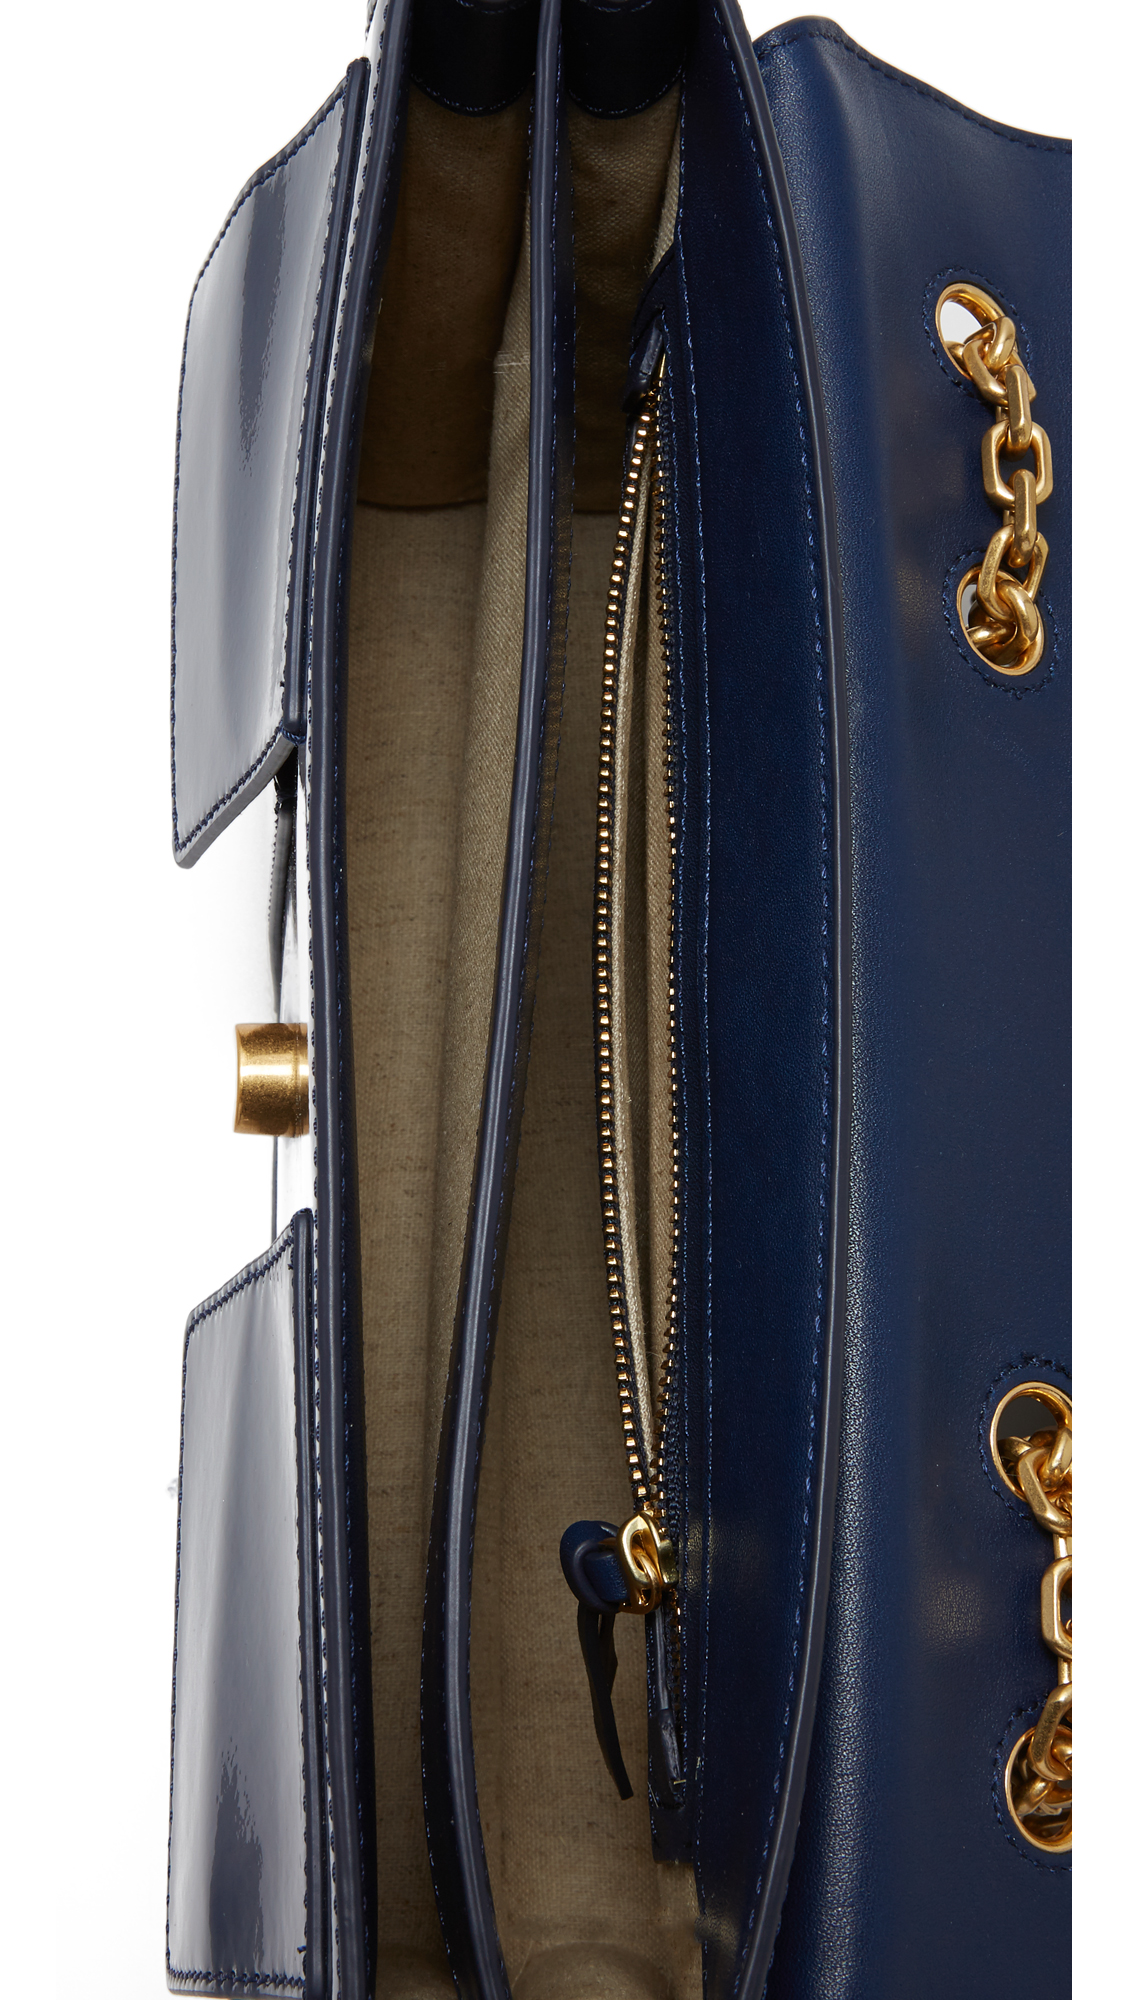 e09e0c7ae18 Tory Burch Gemini Link Medium Chain Shoulder Bag